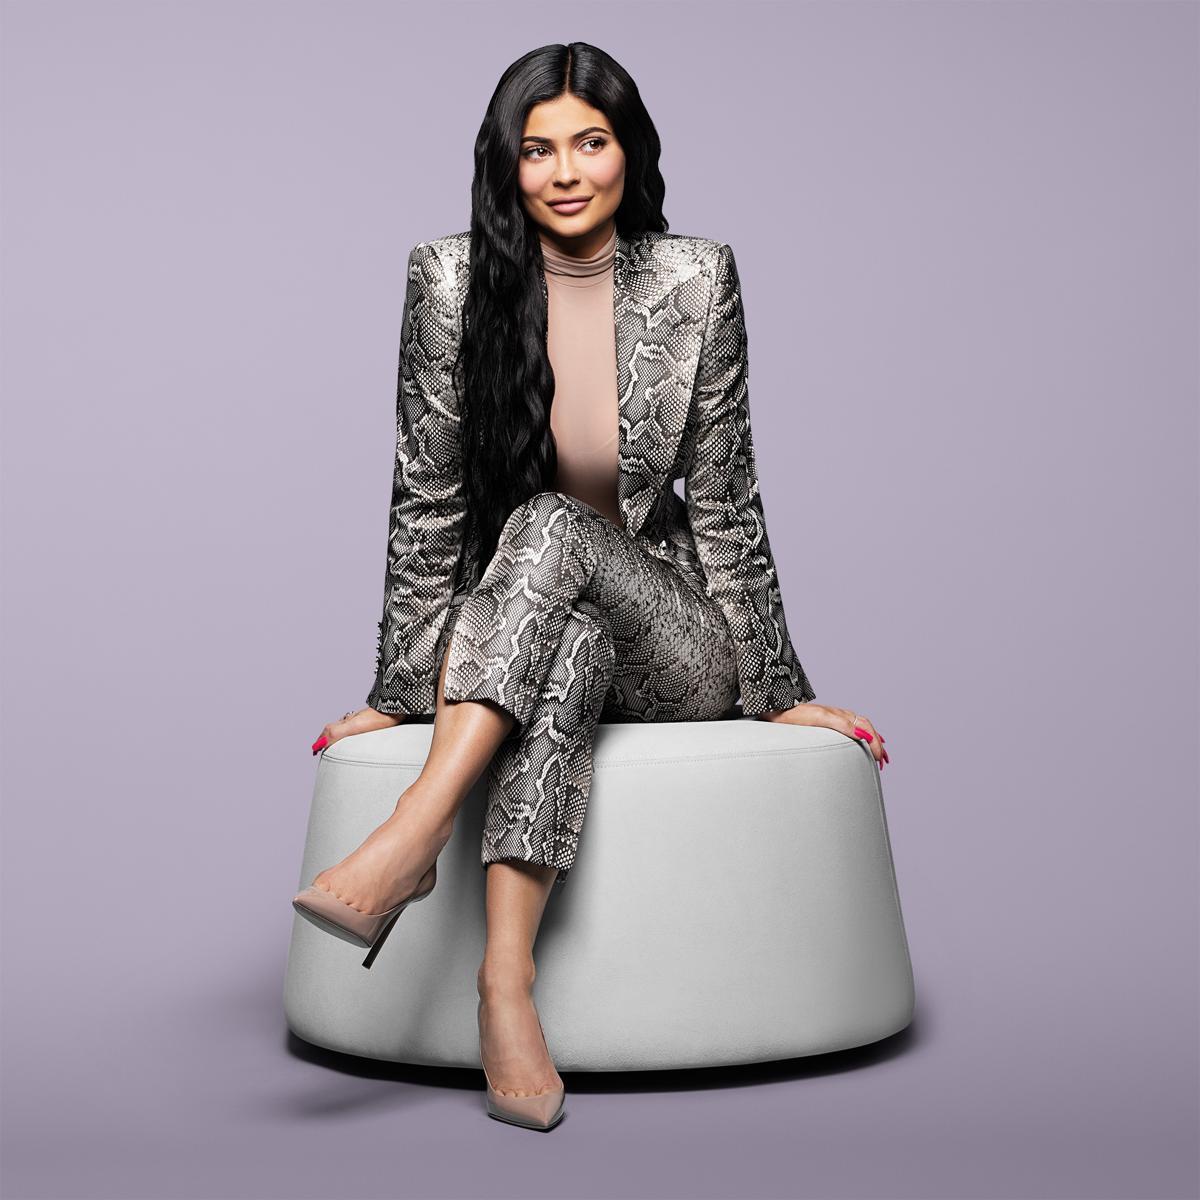 figura de Kylie Jenner